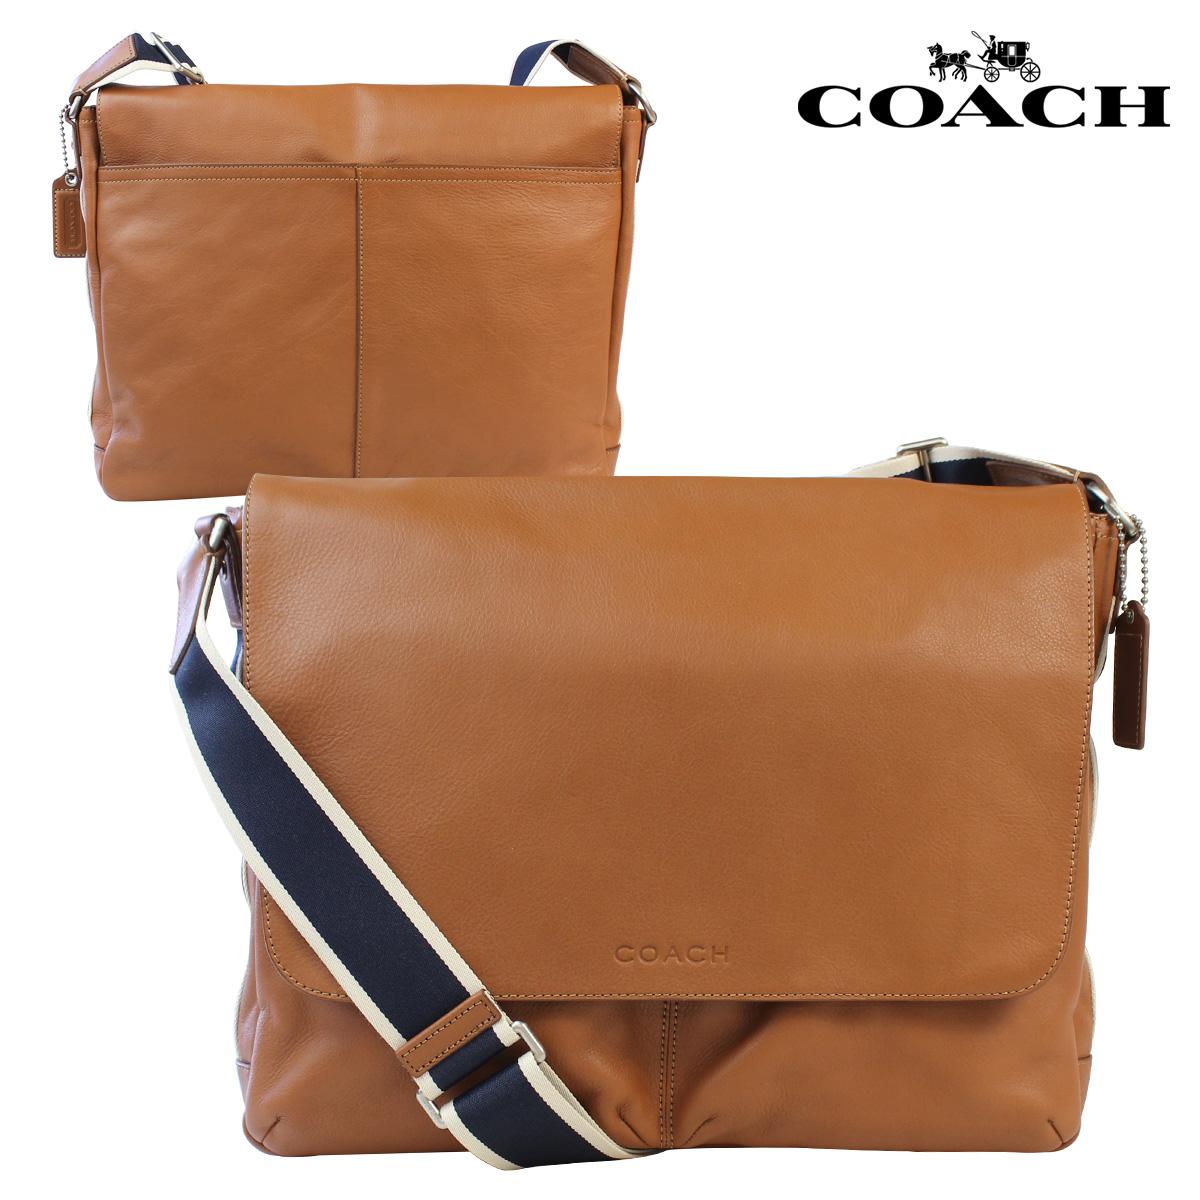 Whats Up Sports Coach Mens Bags Messenger F70556 Saddle Rakuten Global Market